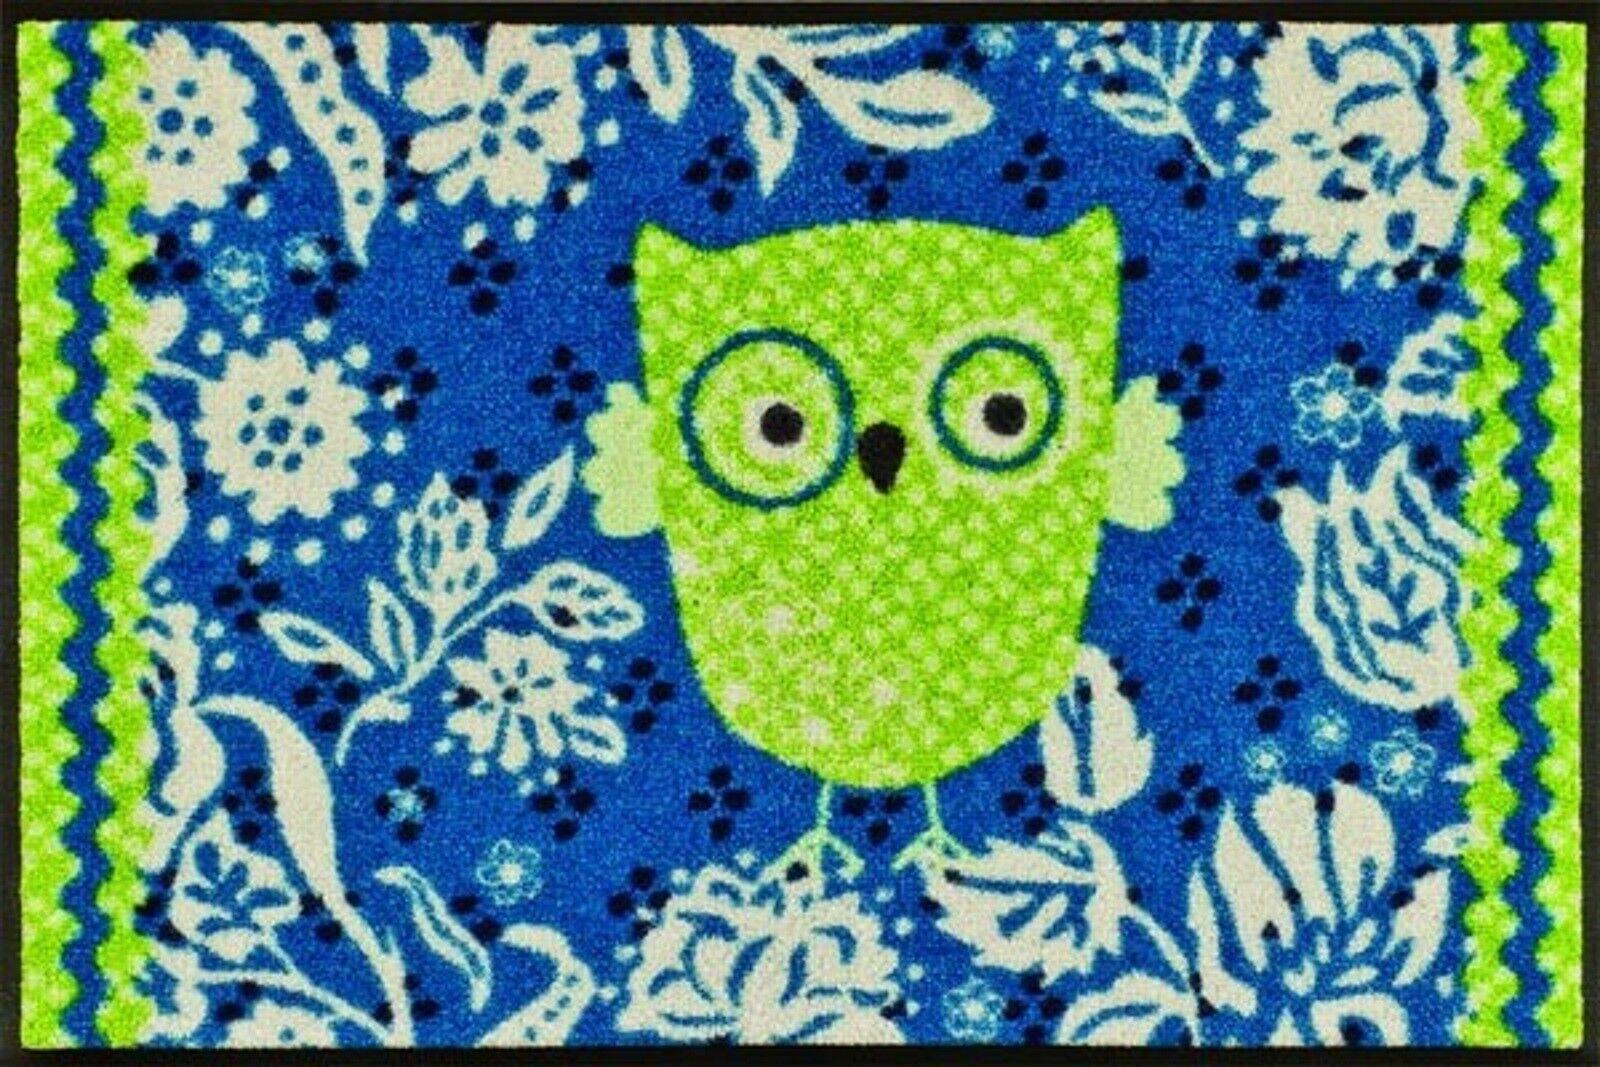 Zerbino GUFO türmatte türmatte türmatte OWLY 50x75 cm fußabtreter pulito tapis tappetino fußabstreifer 1e4812